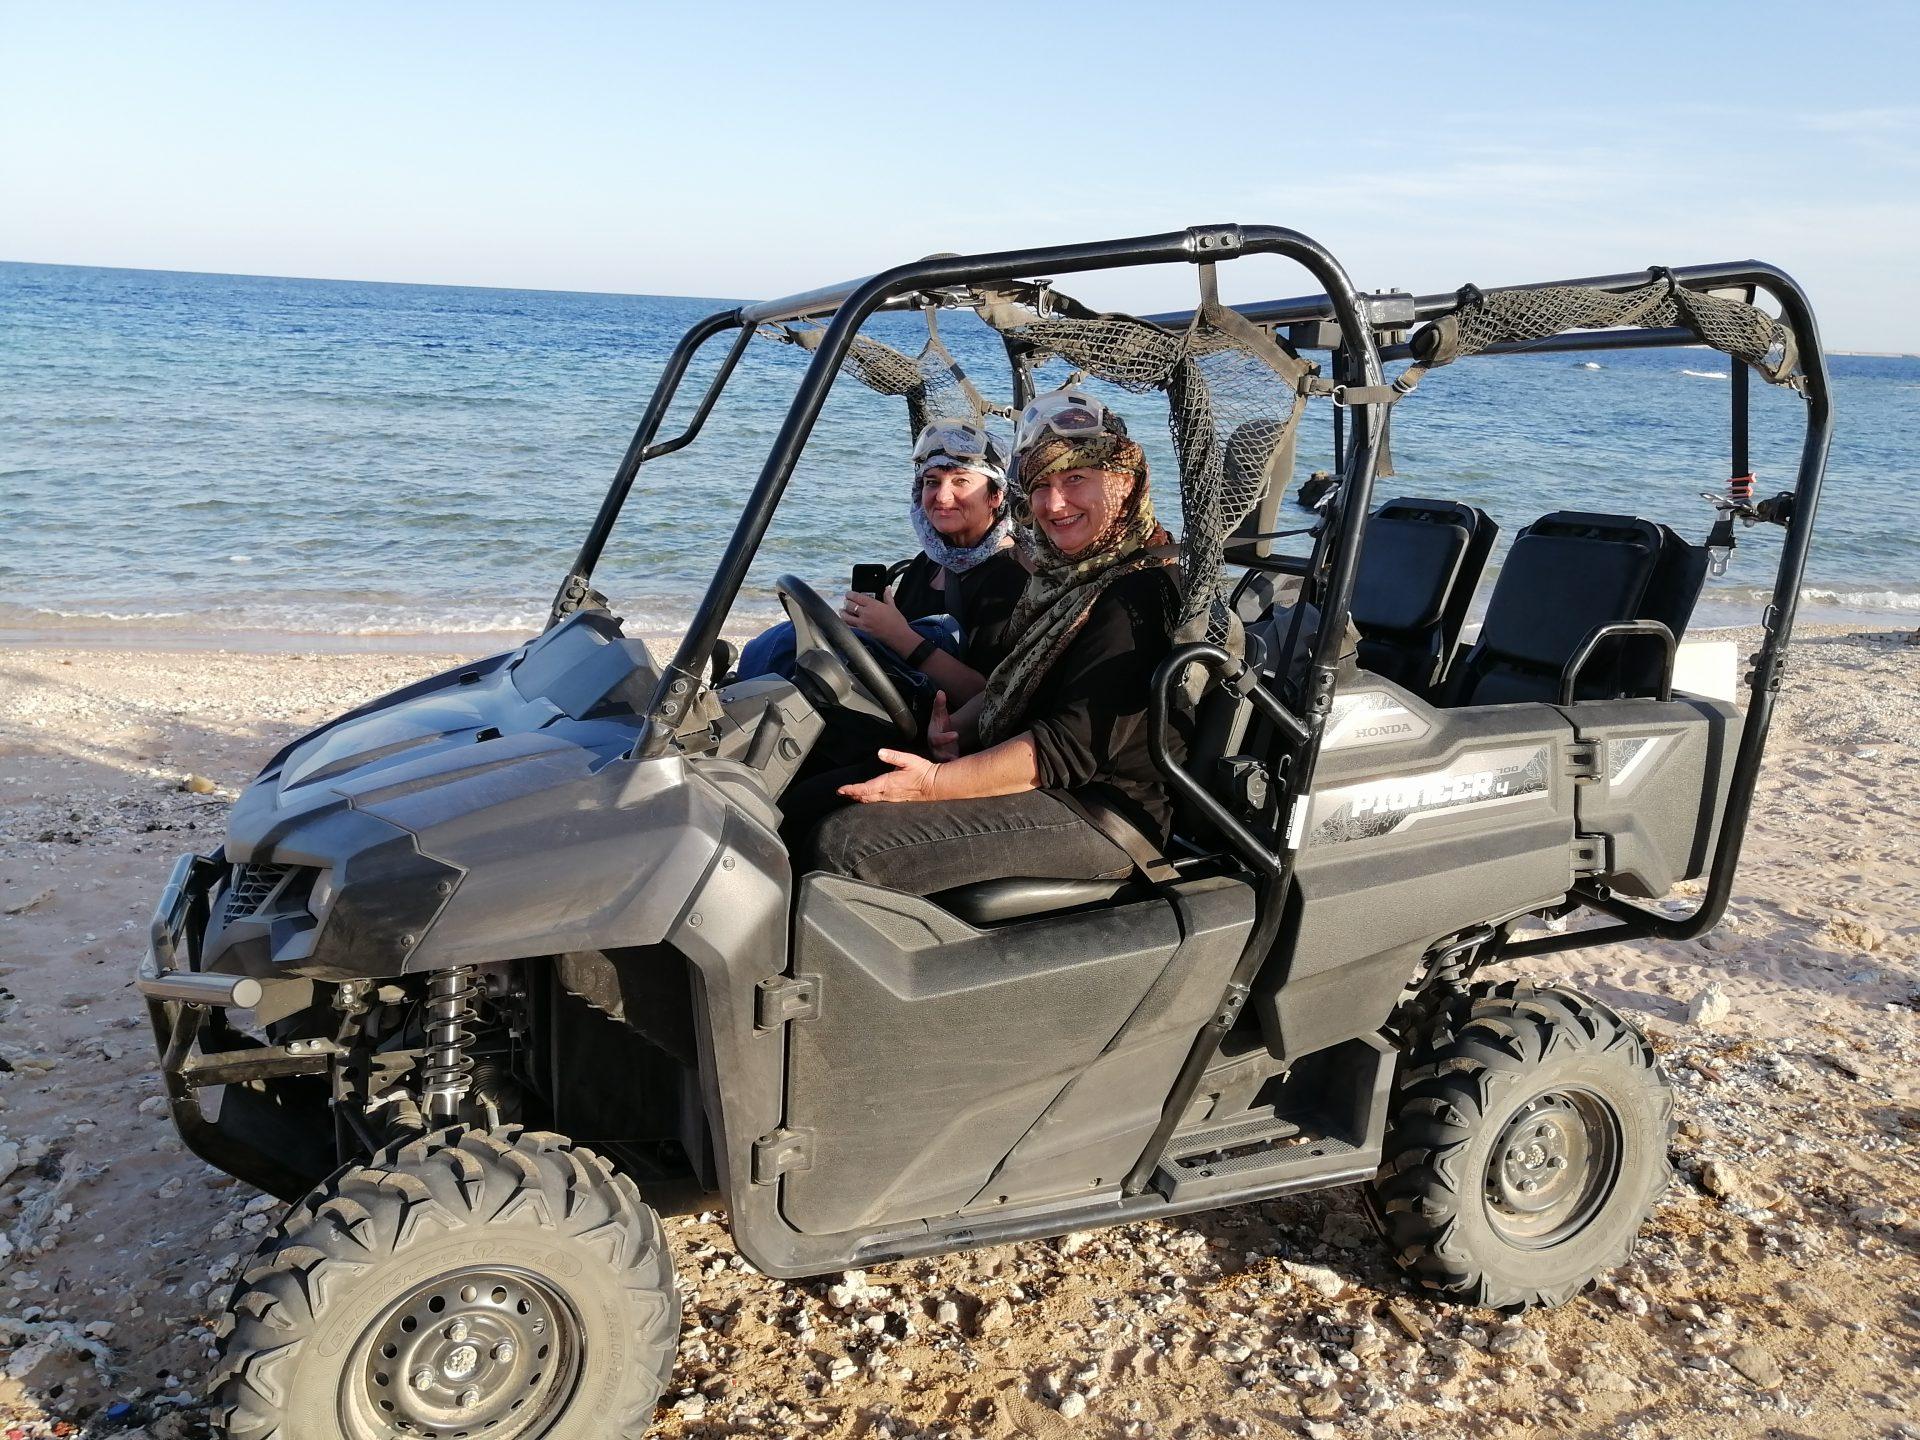 Buggy Tour | Berge und Meer